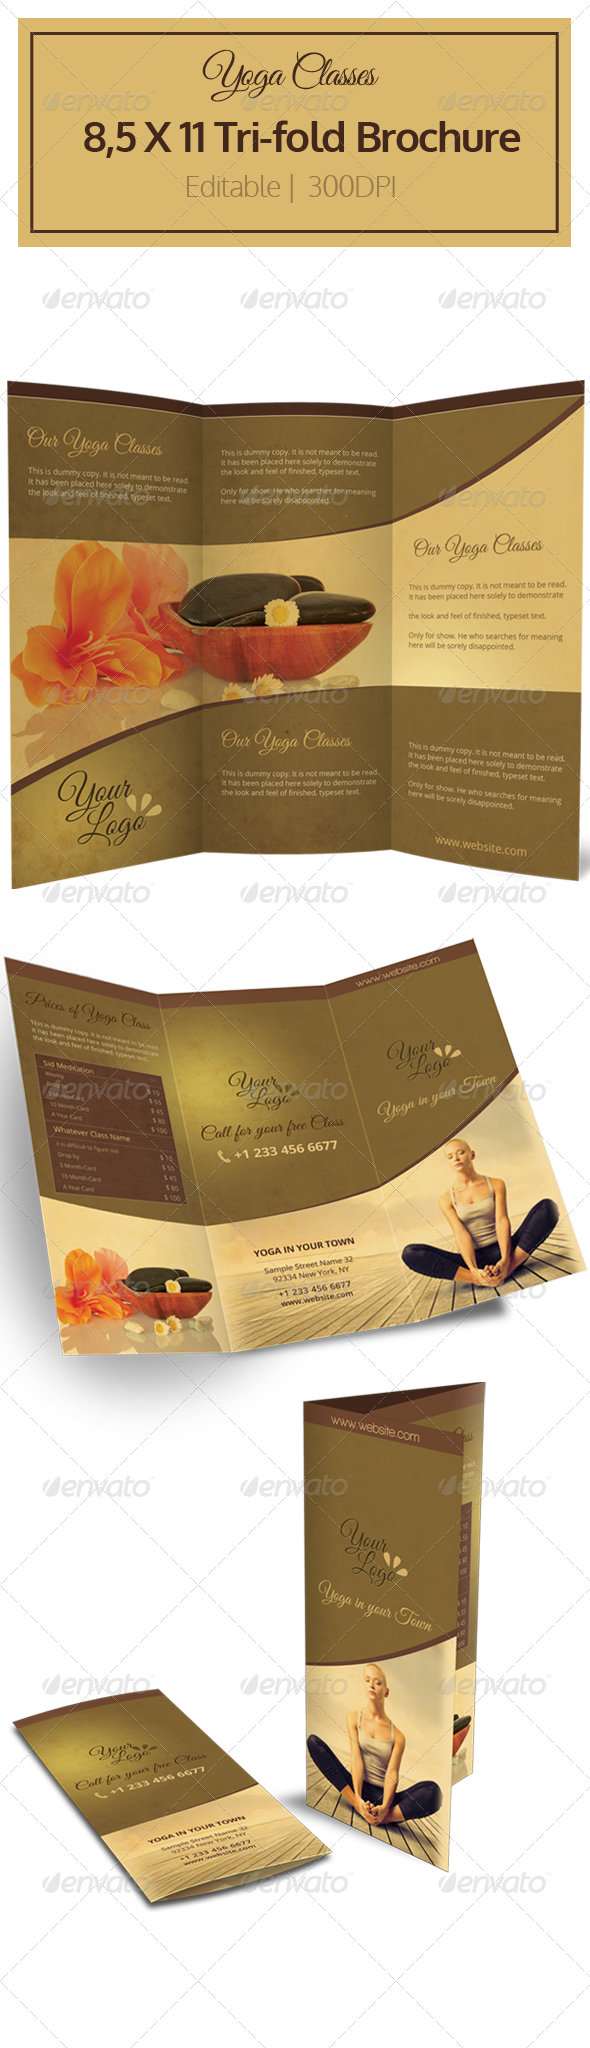 yoga brochure templates - yoga tri fold brochure graphicriver